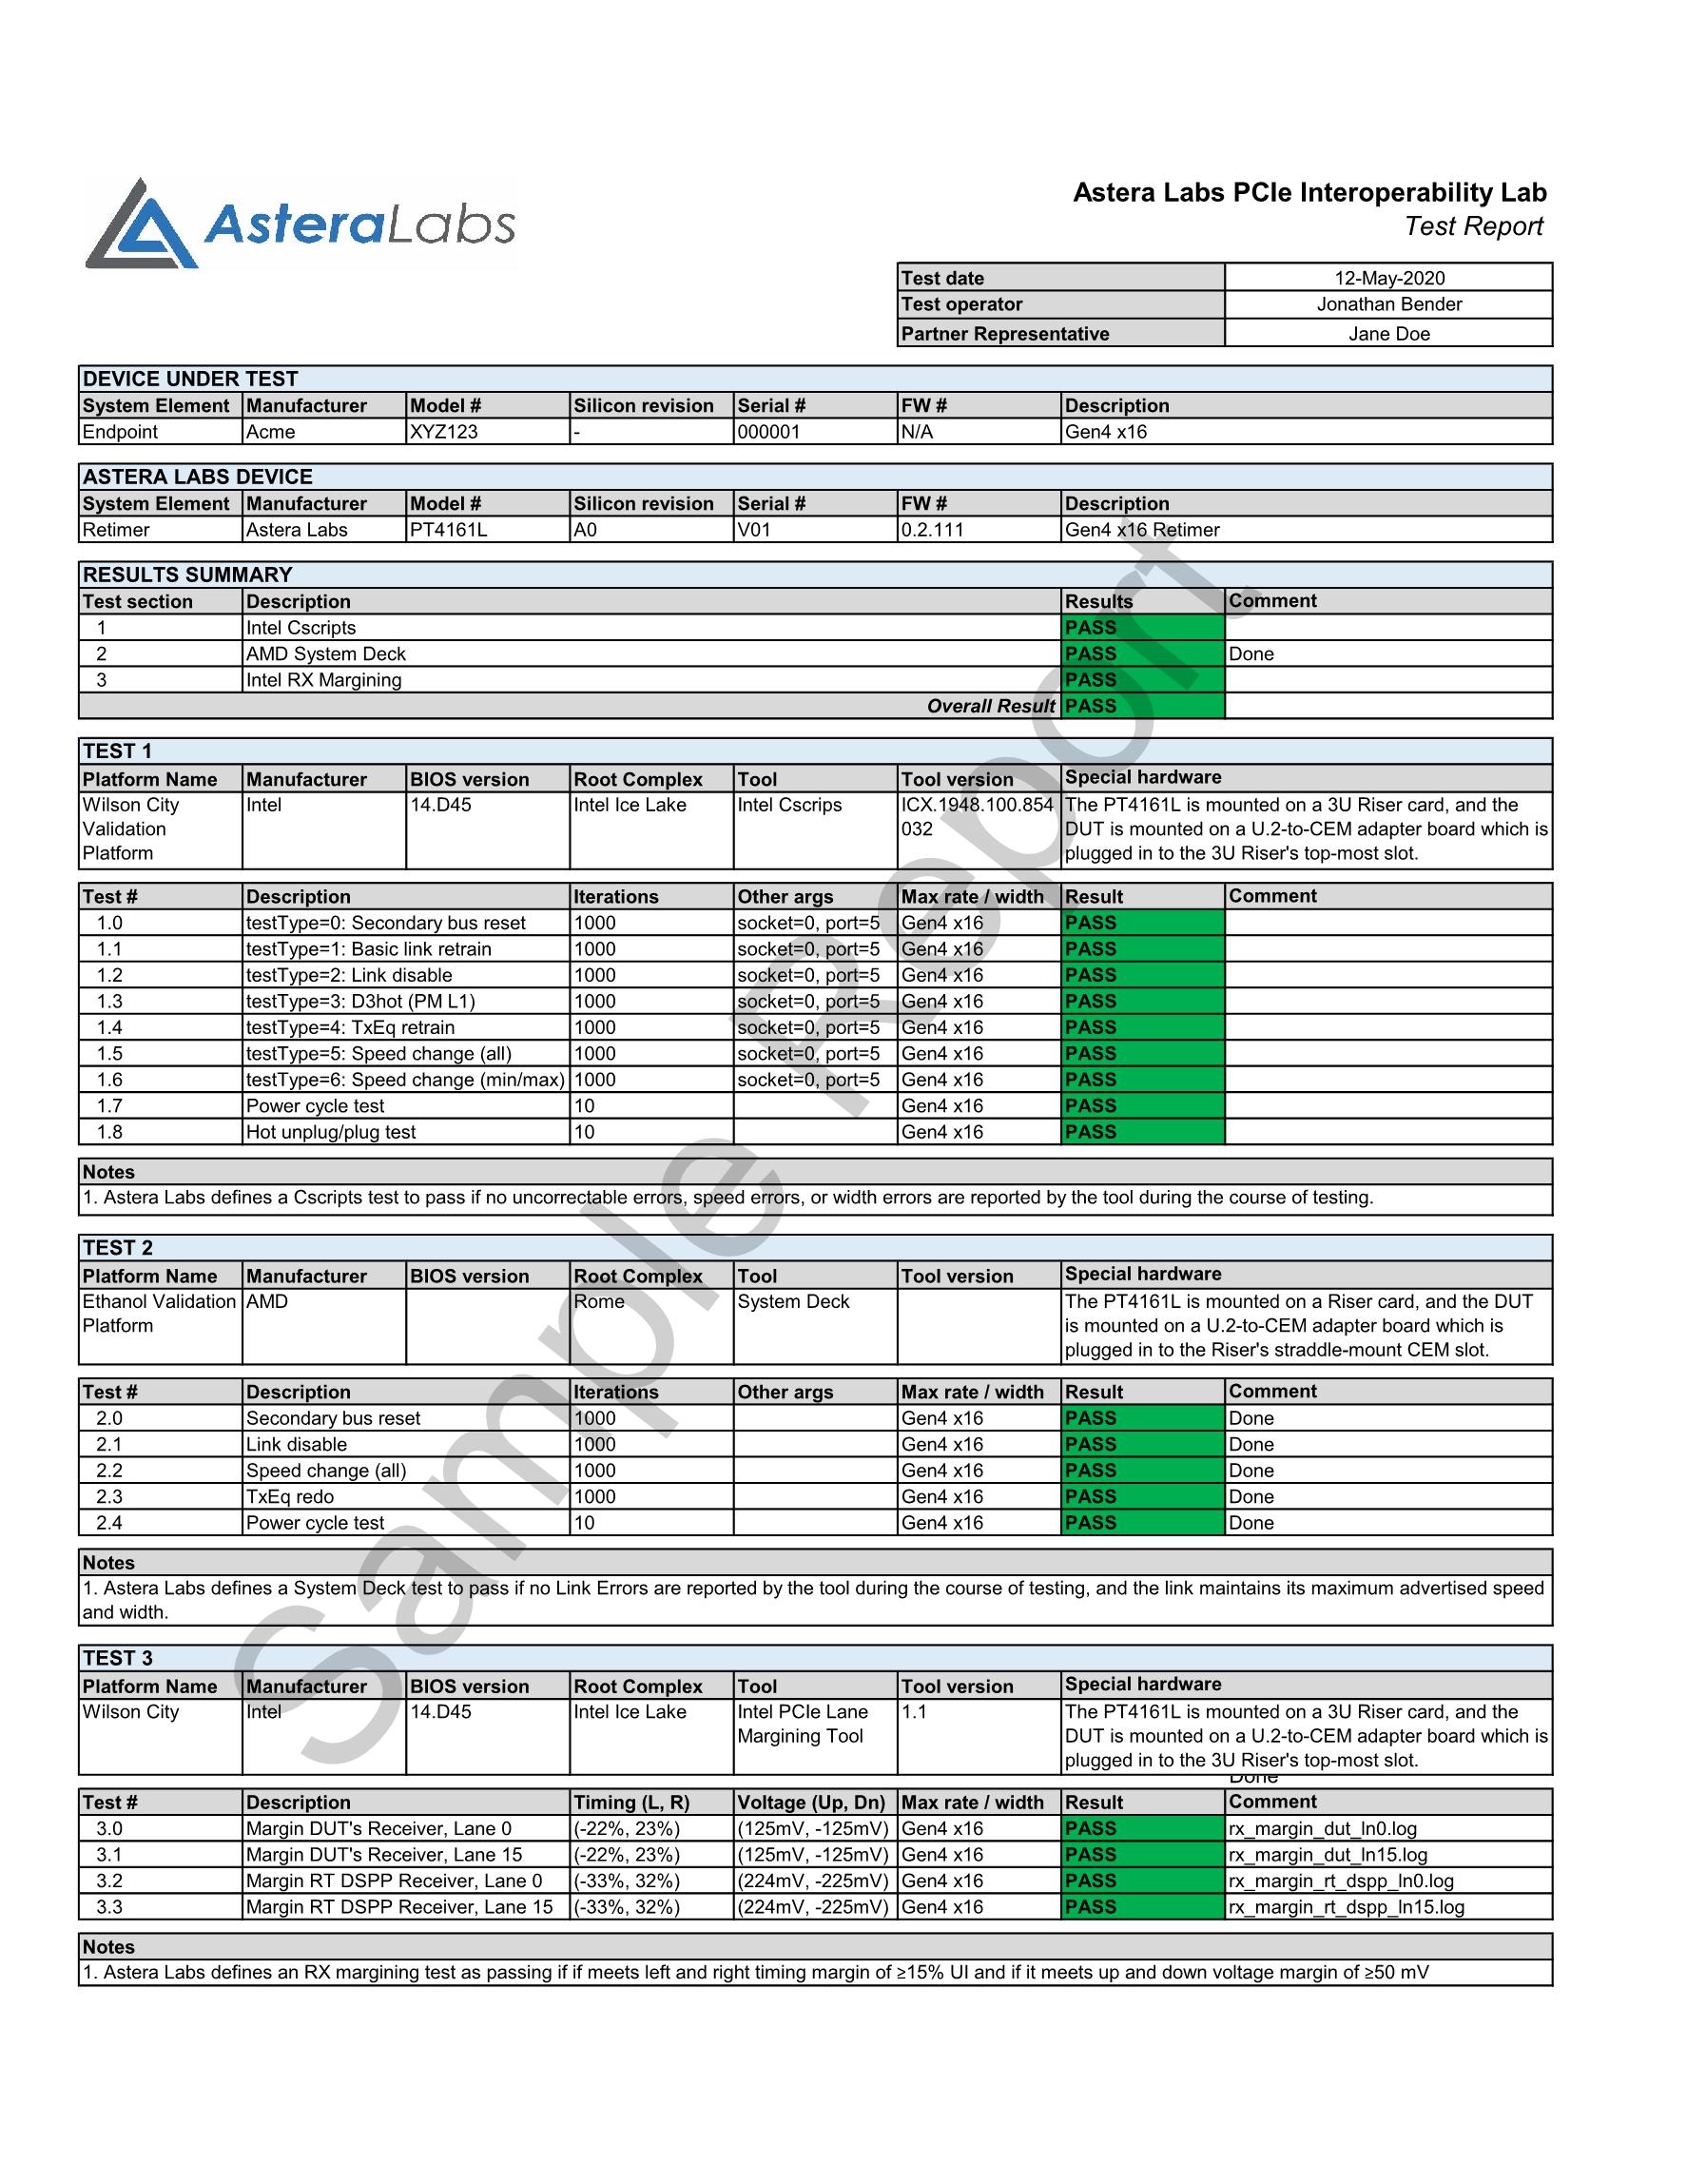 Astera_Labs_PCIe_Interop_Report-SAMPLE_image1